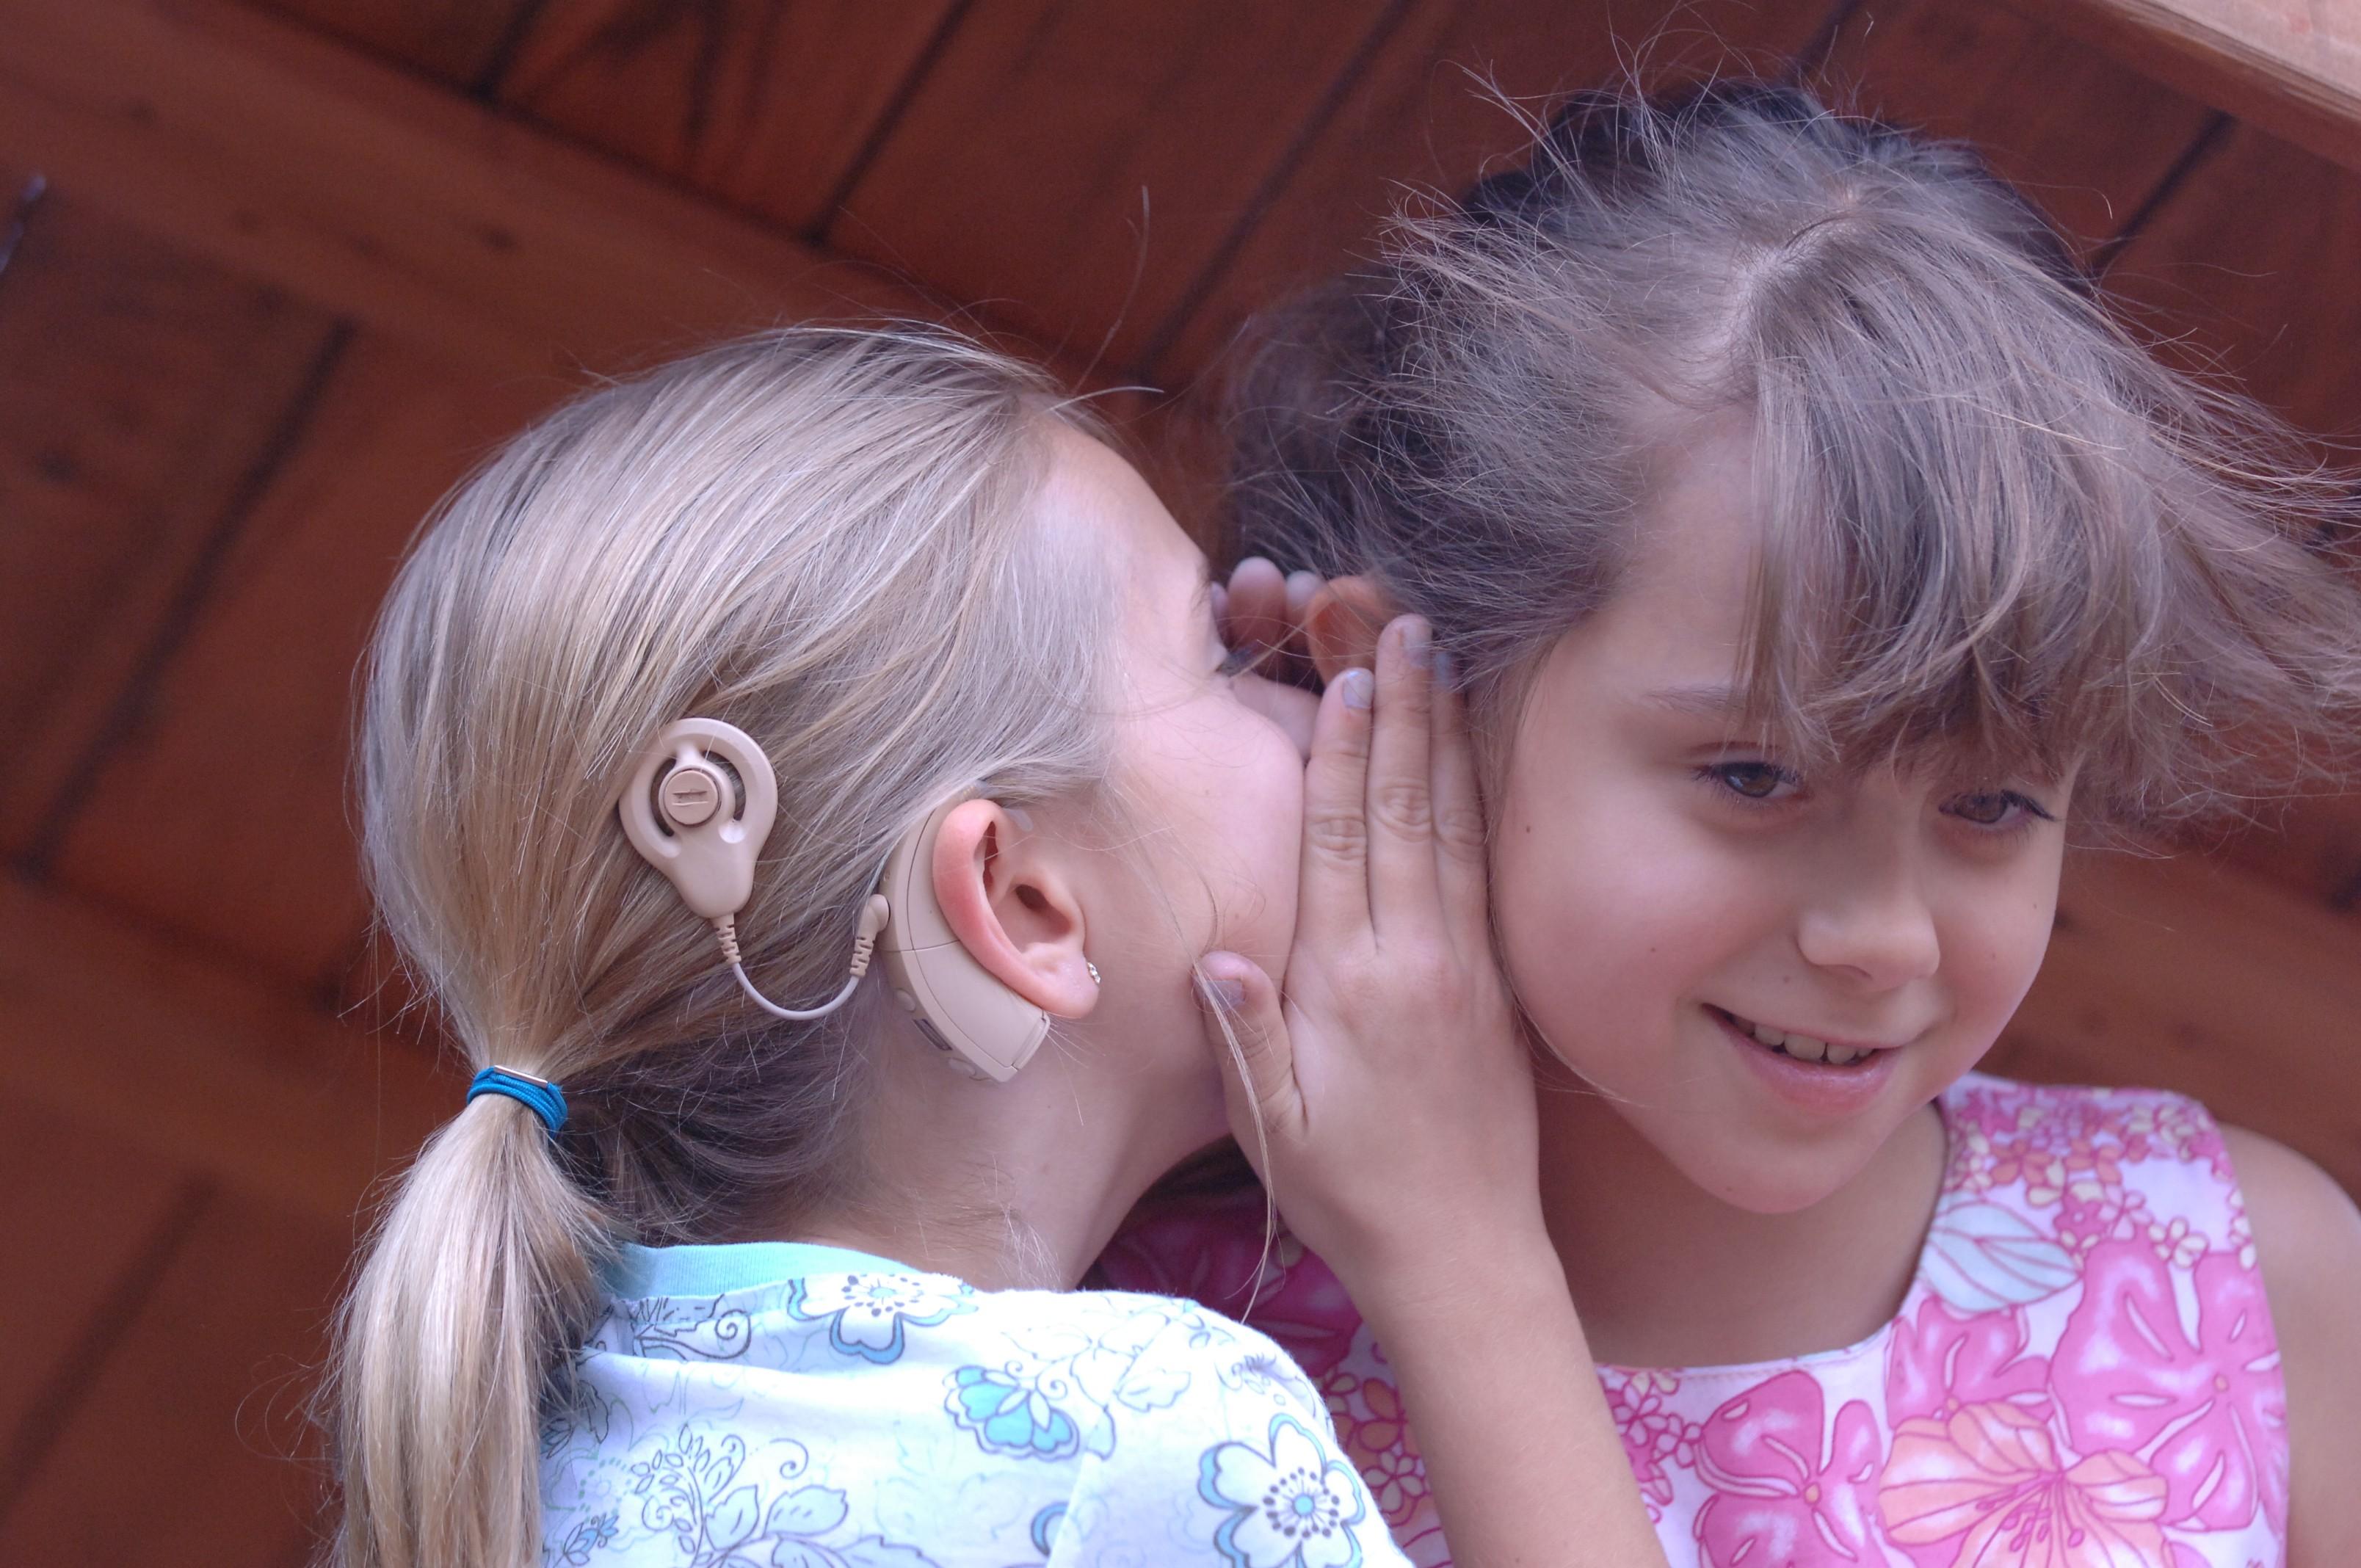 Deaf children targeted for sexual crimes